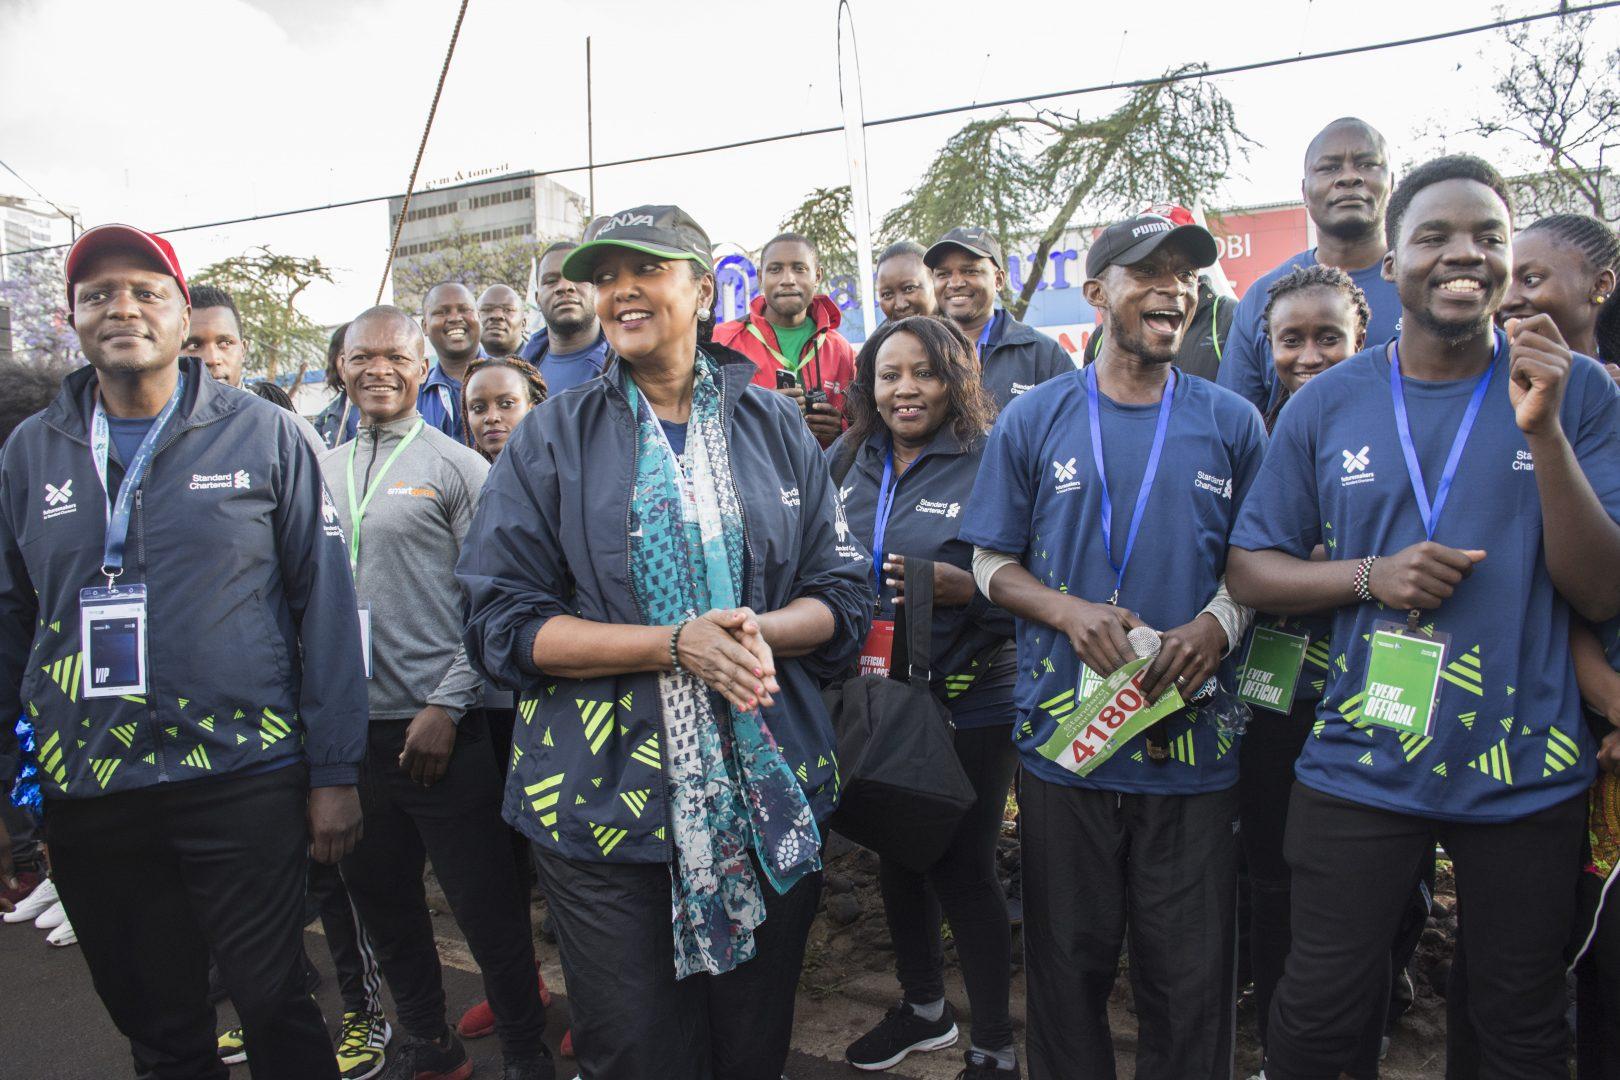 https://www.nairobimarathon.com/wp-content/uploads/2021/07/DSC_2897.jpg